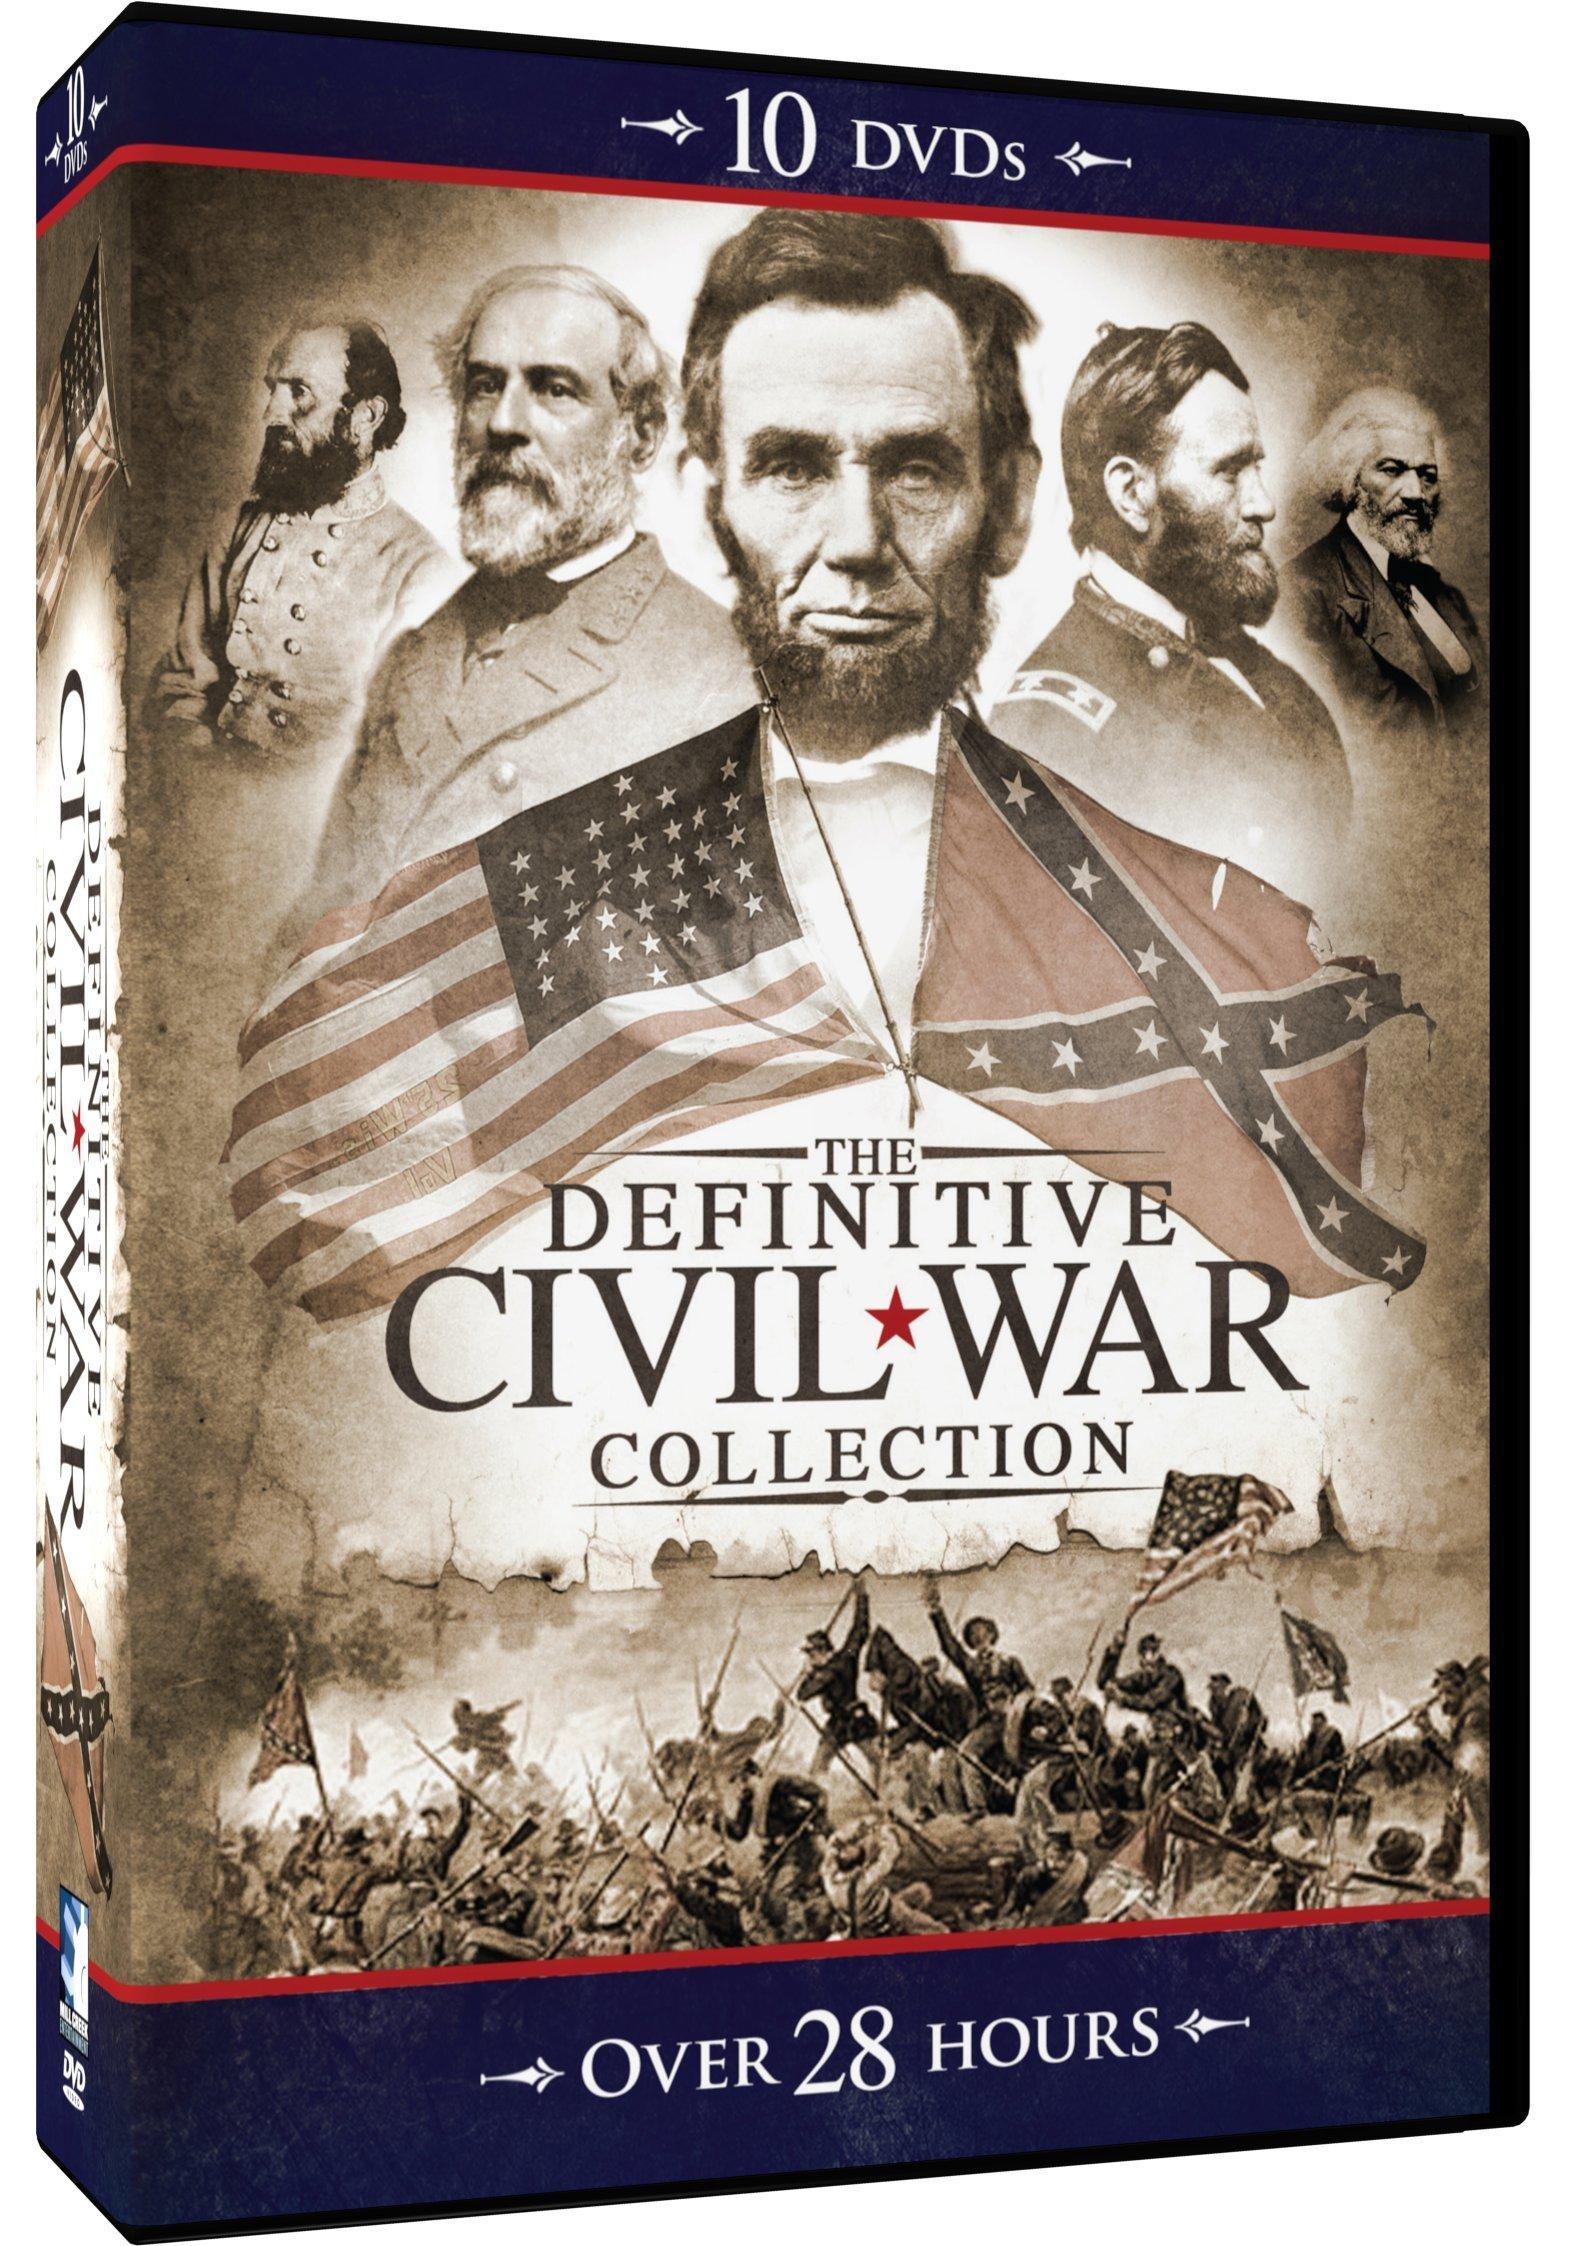 Definitive Civil War Collection - 10 DVD MegaCollection